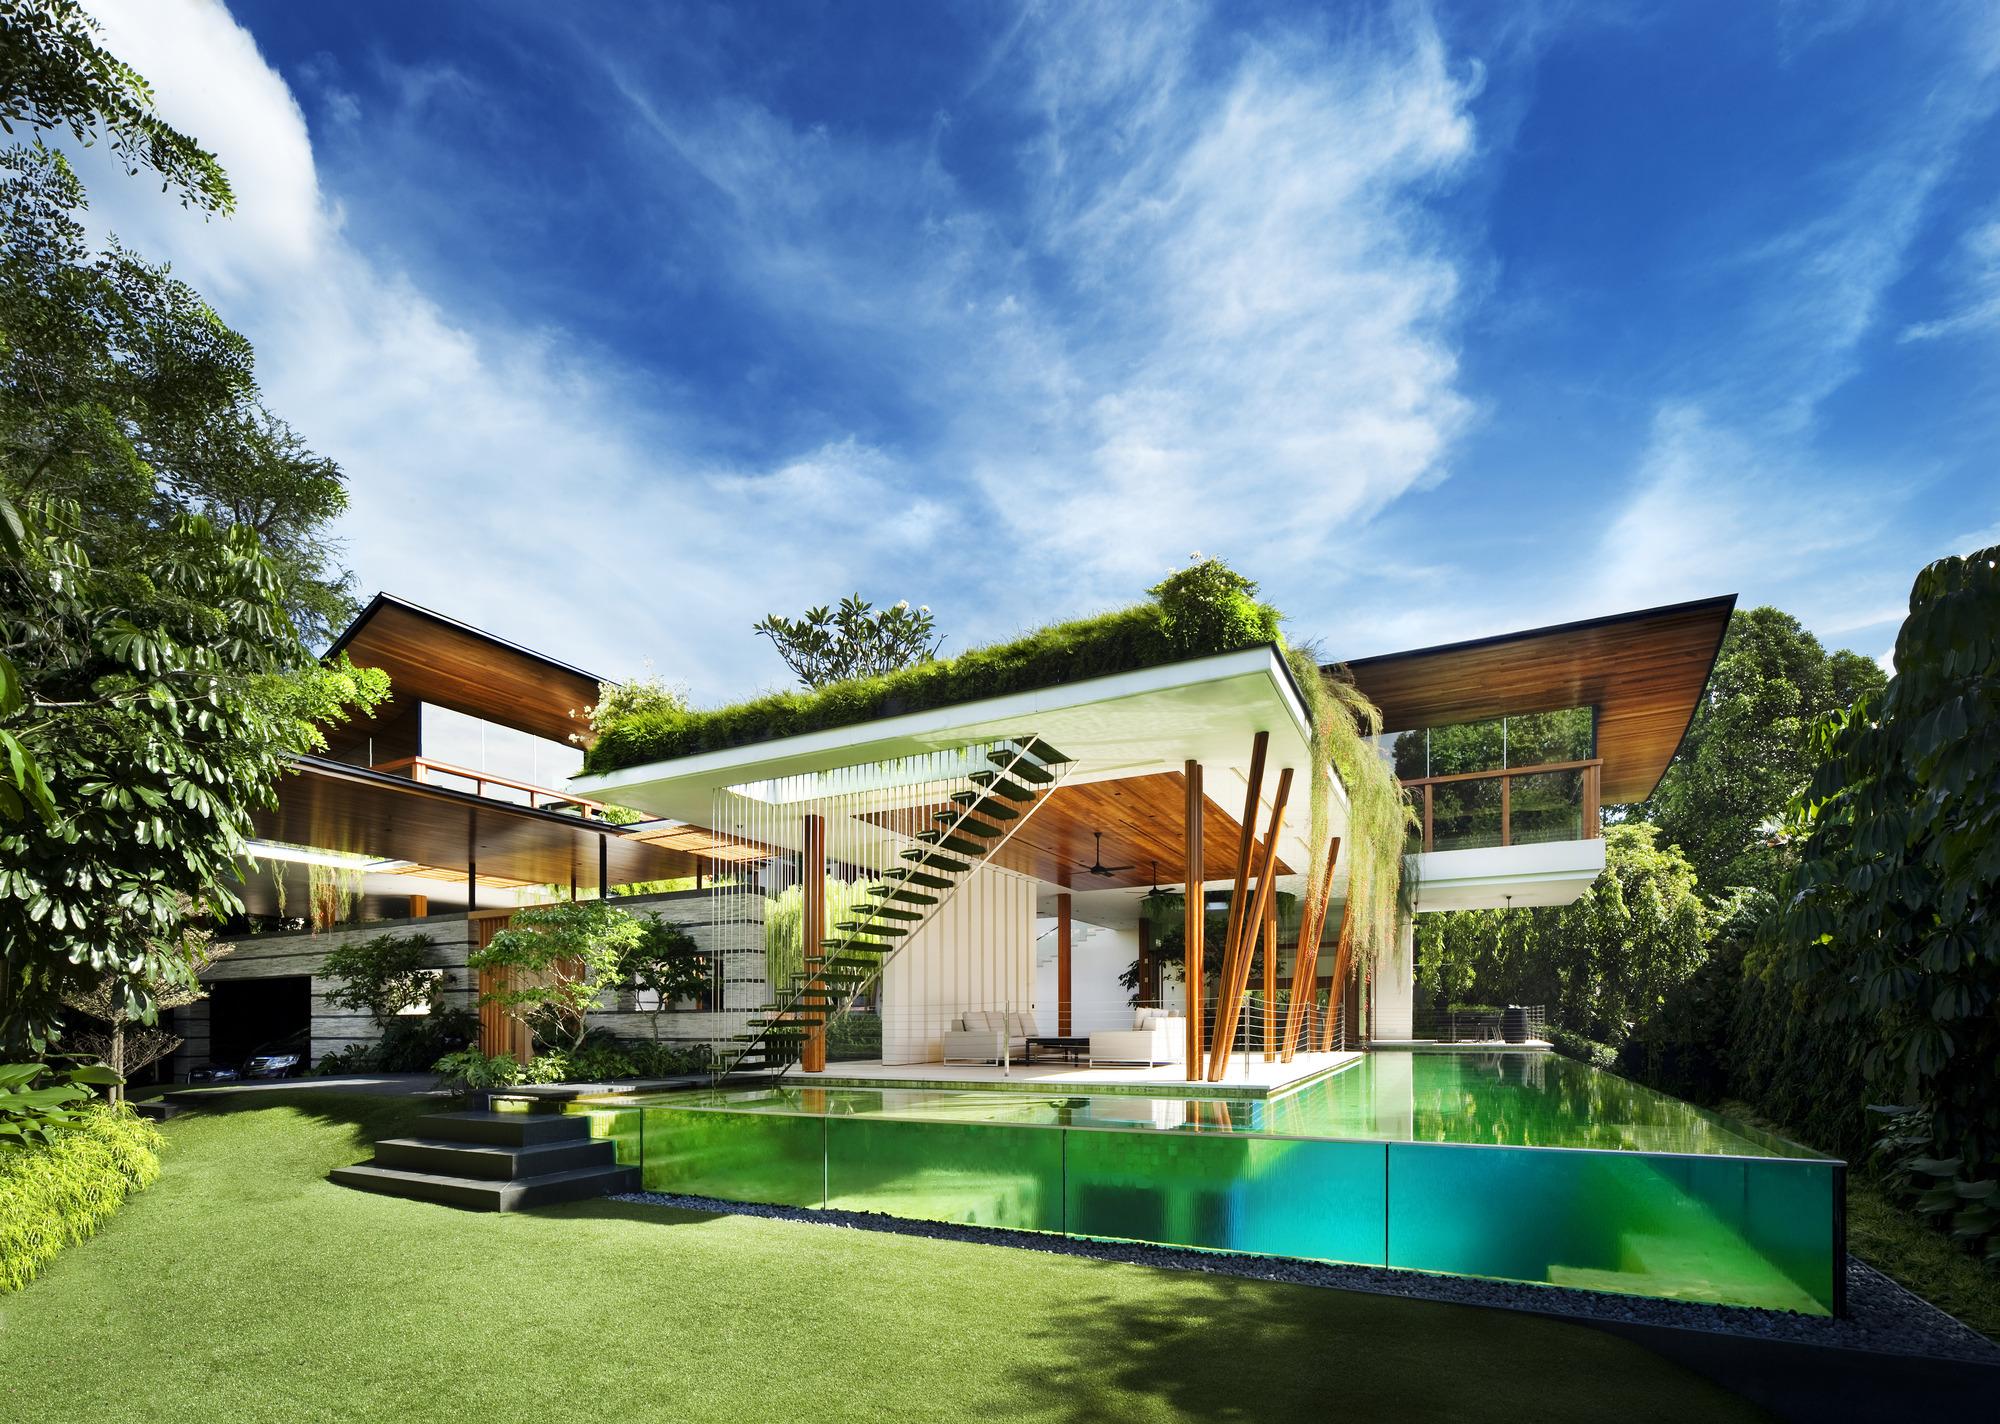 Willow House / Guz Architects